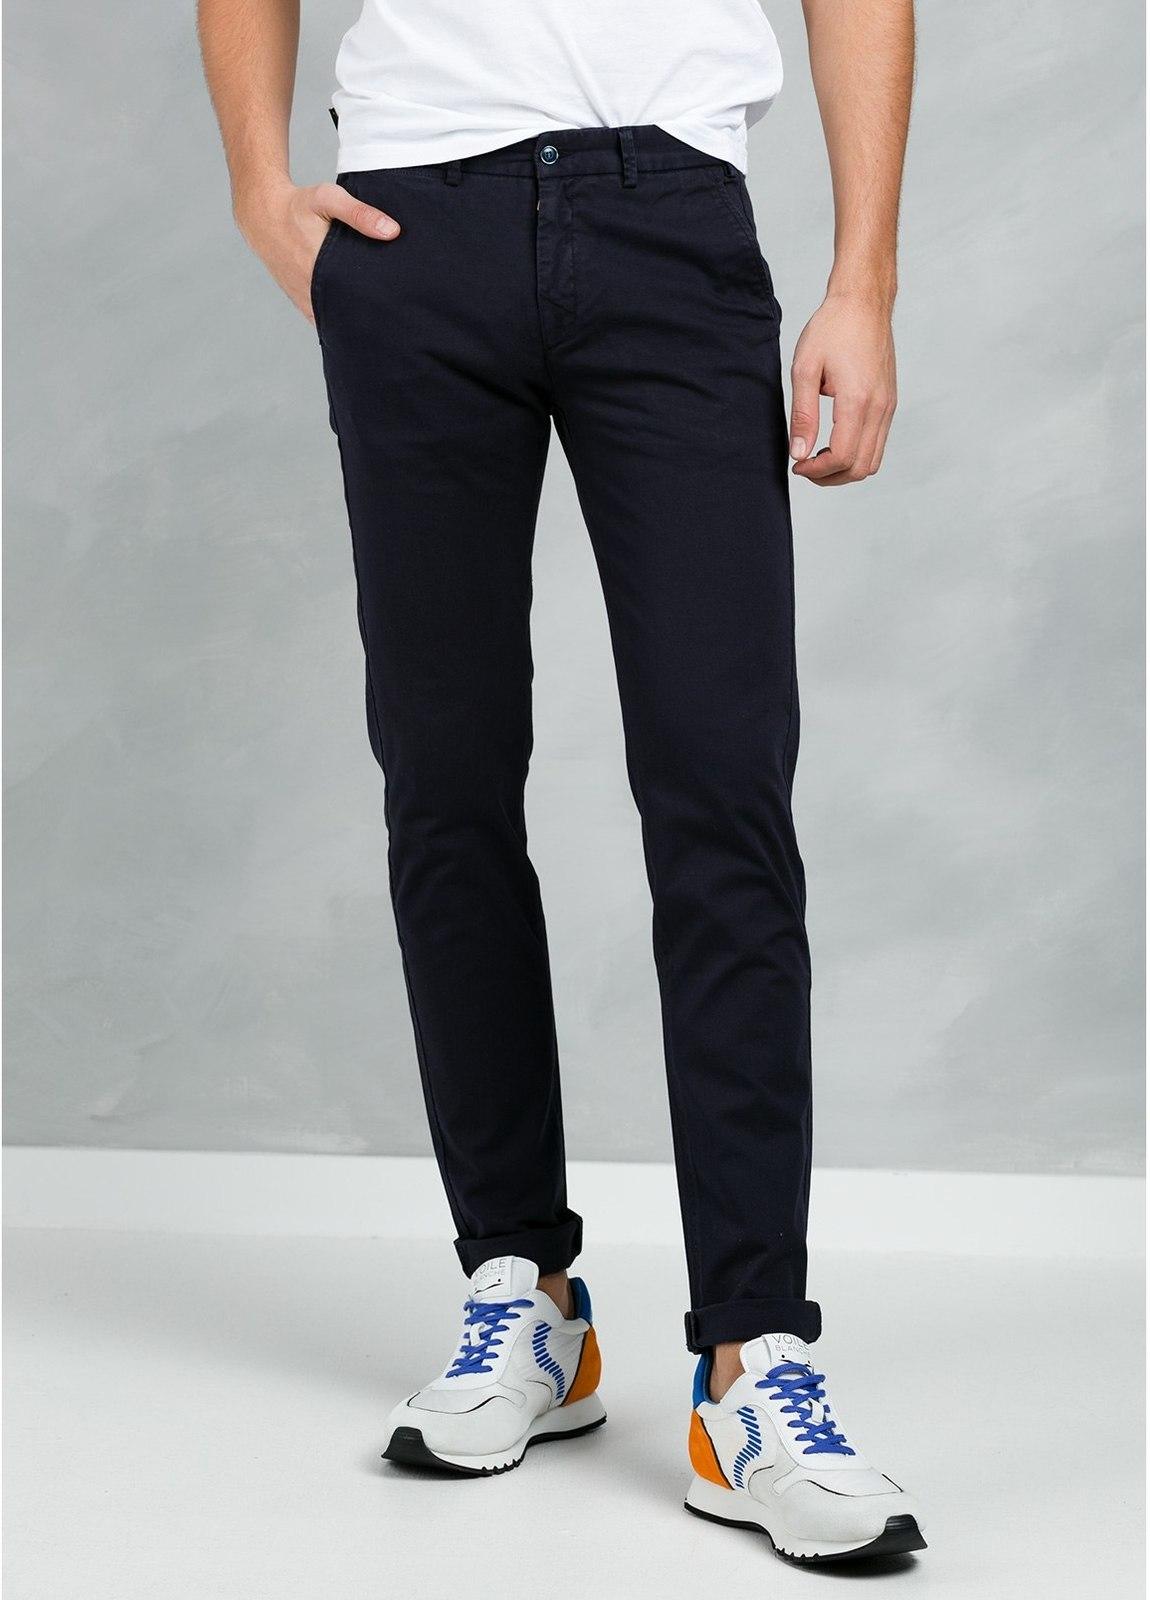 Pantalón Casual Wear, SLIM FIT micro textura color azul marino, 97% Algodón 3% Elastómero.